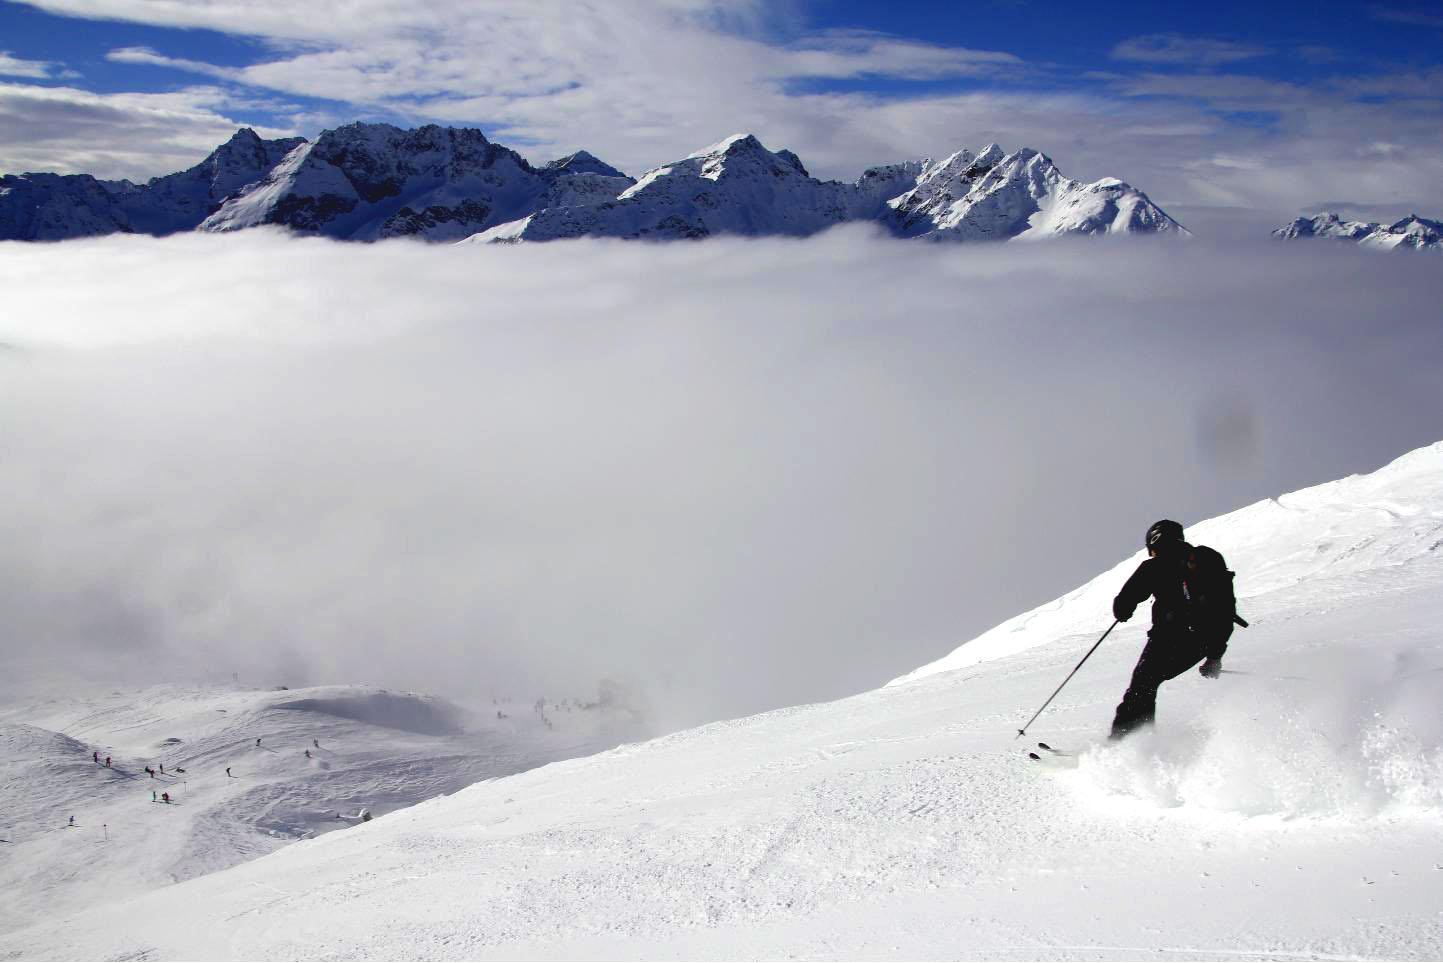 Cloud skiing St Anton © JonoVernon-Powell